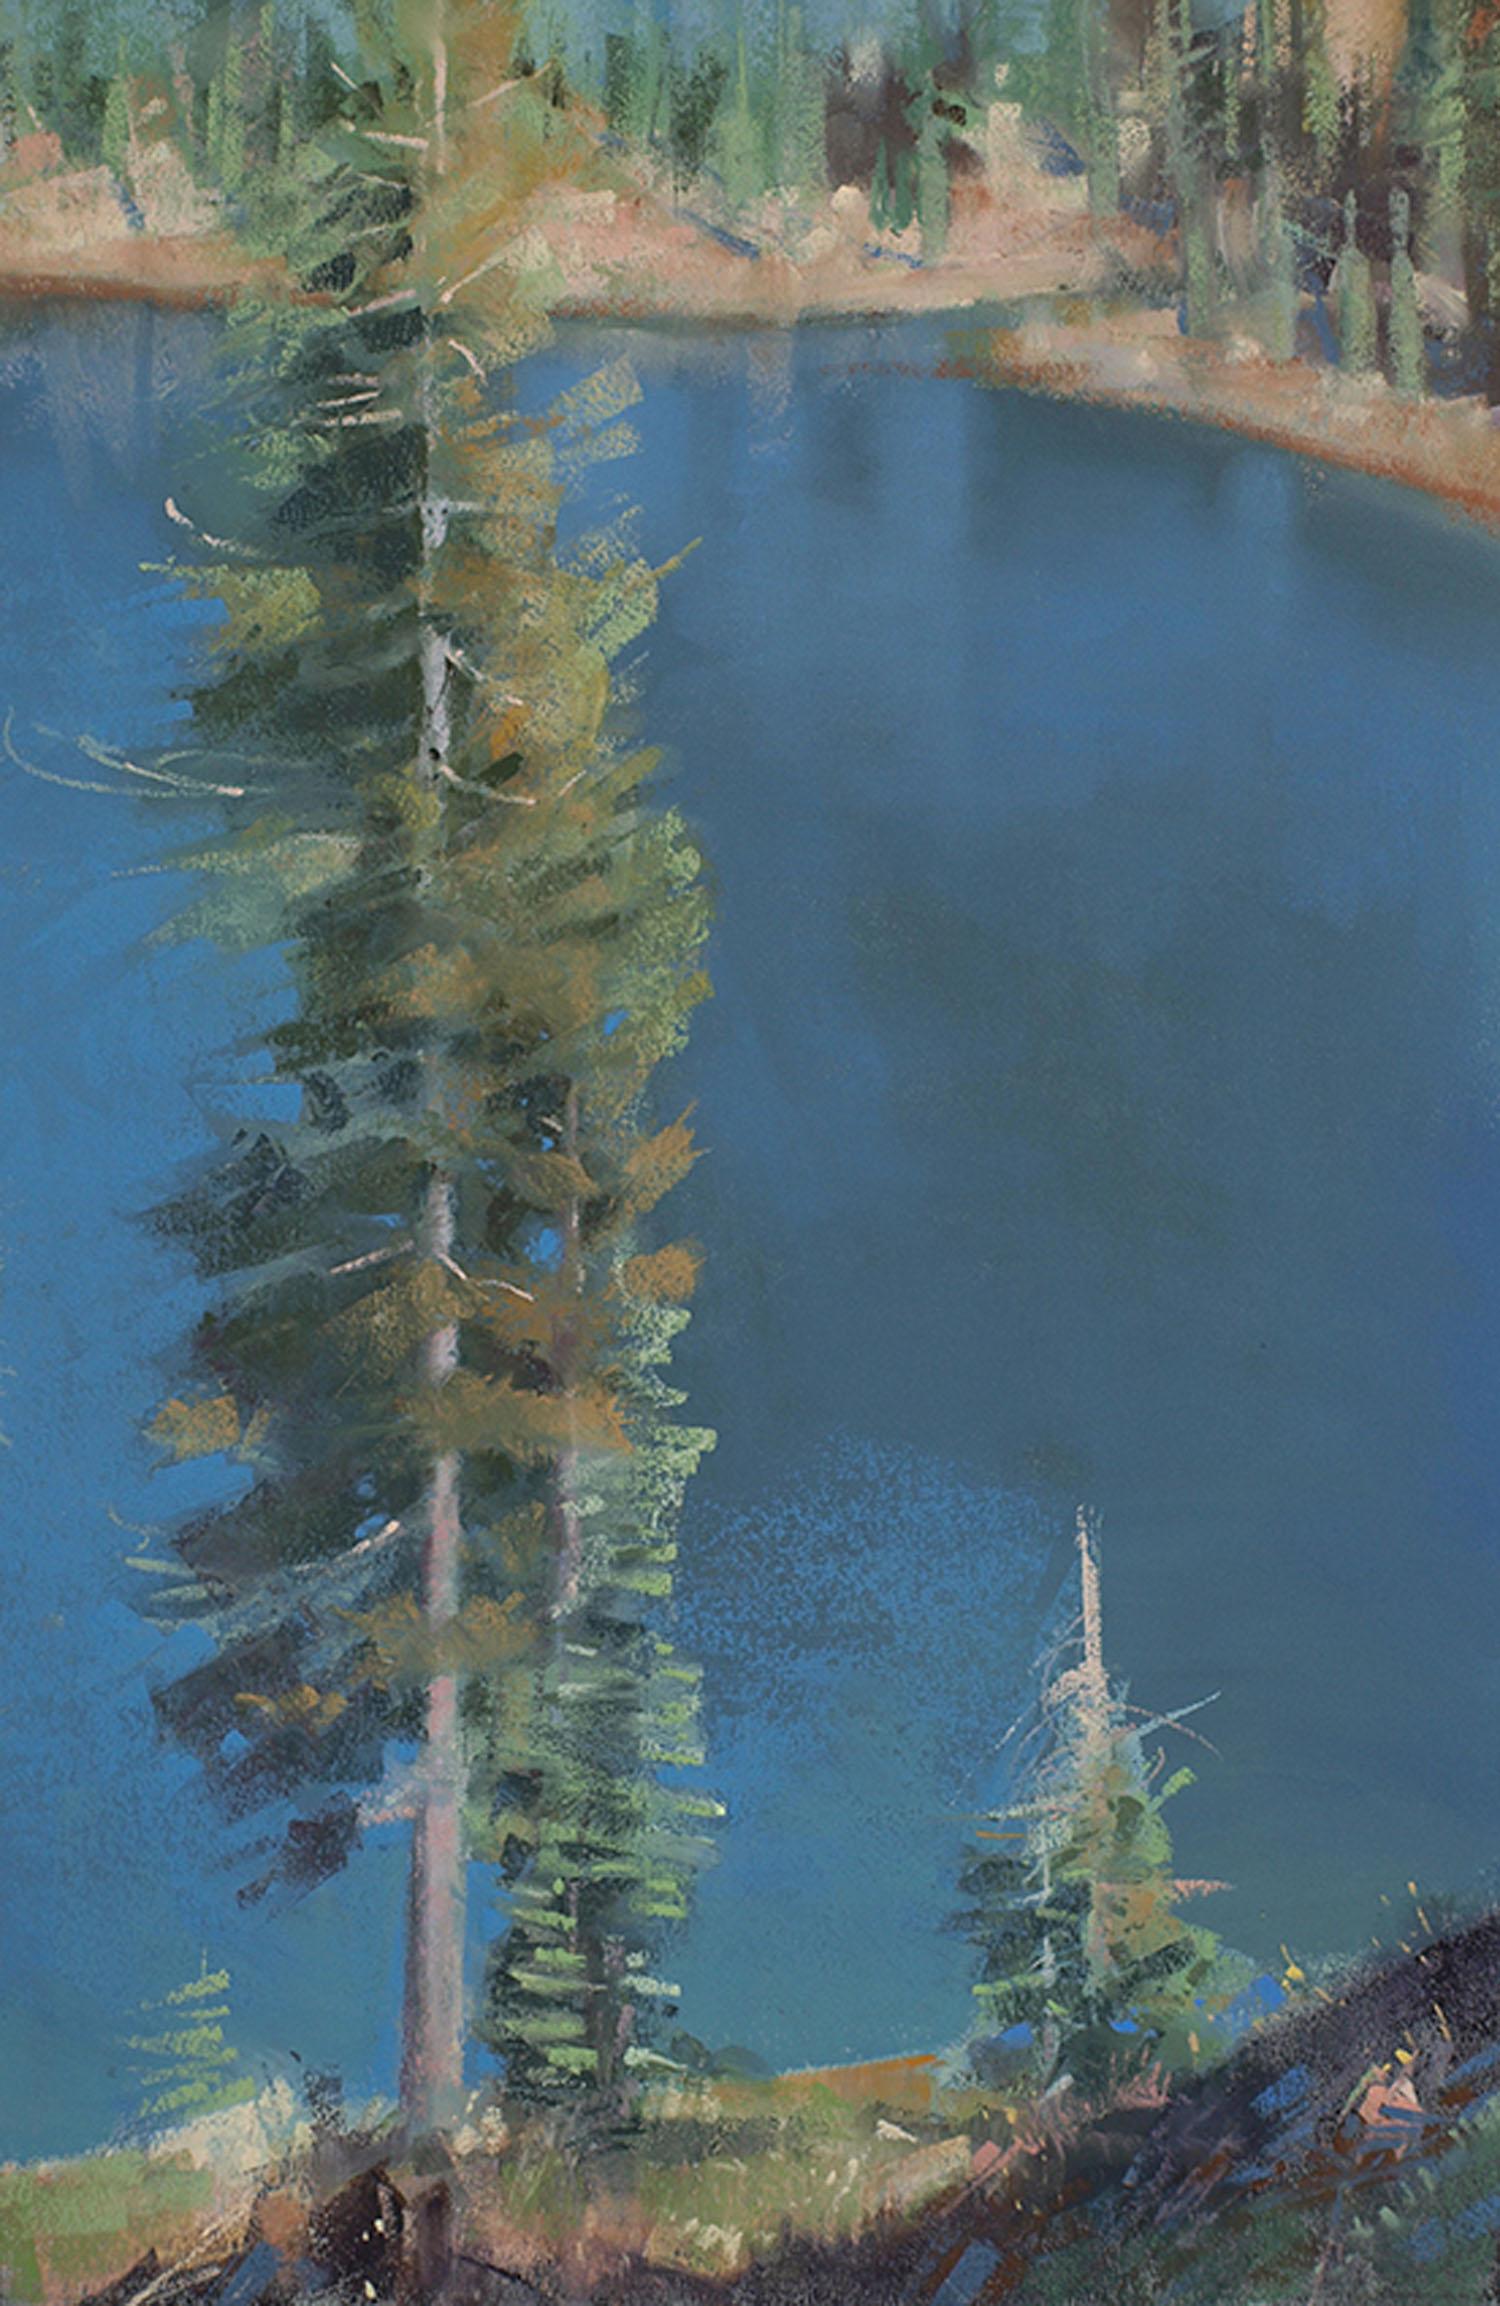 Above Deer Lake